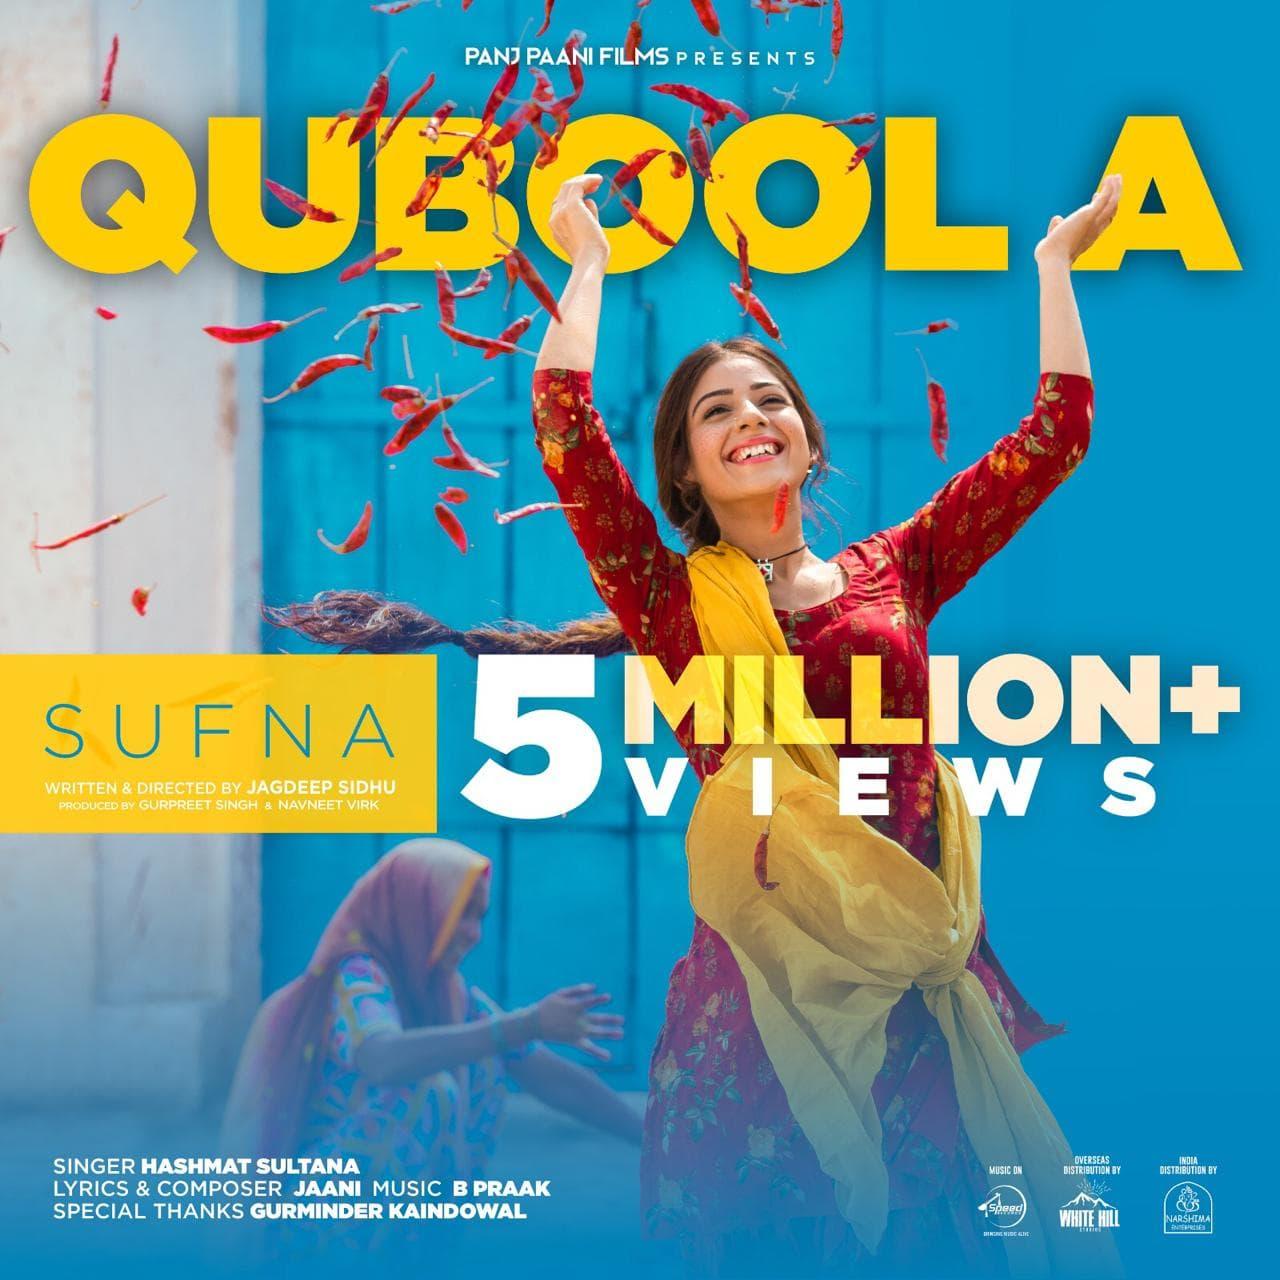 qubool a 5 million plus views